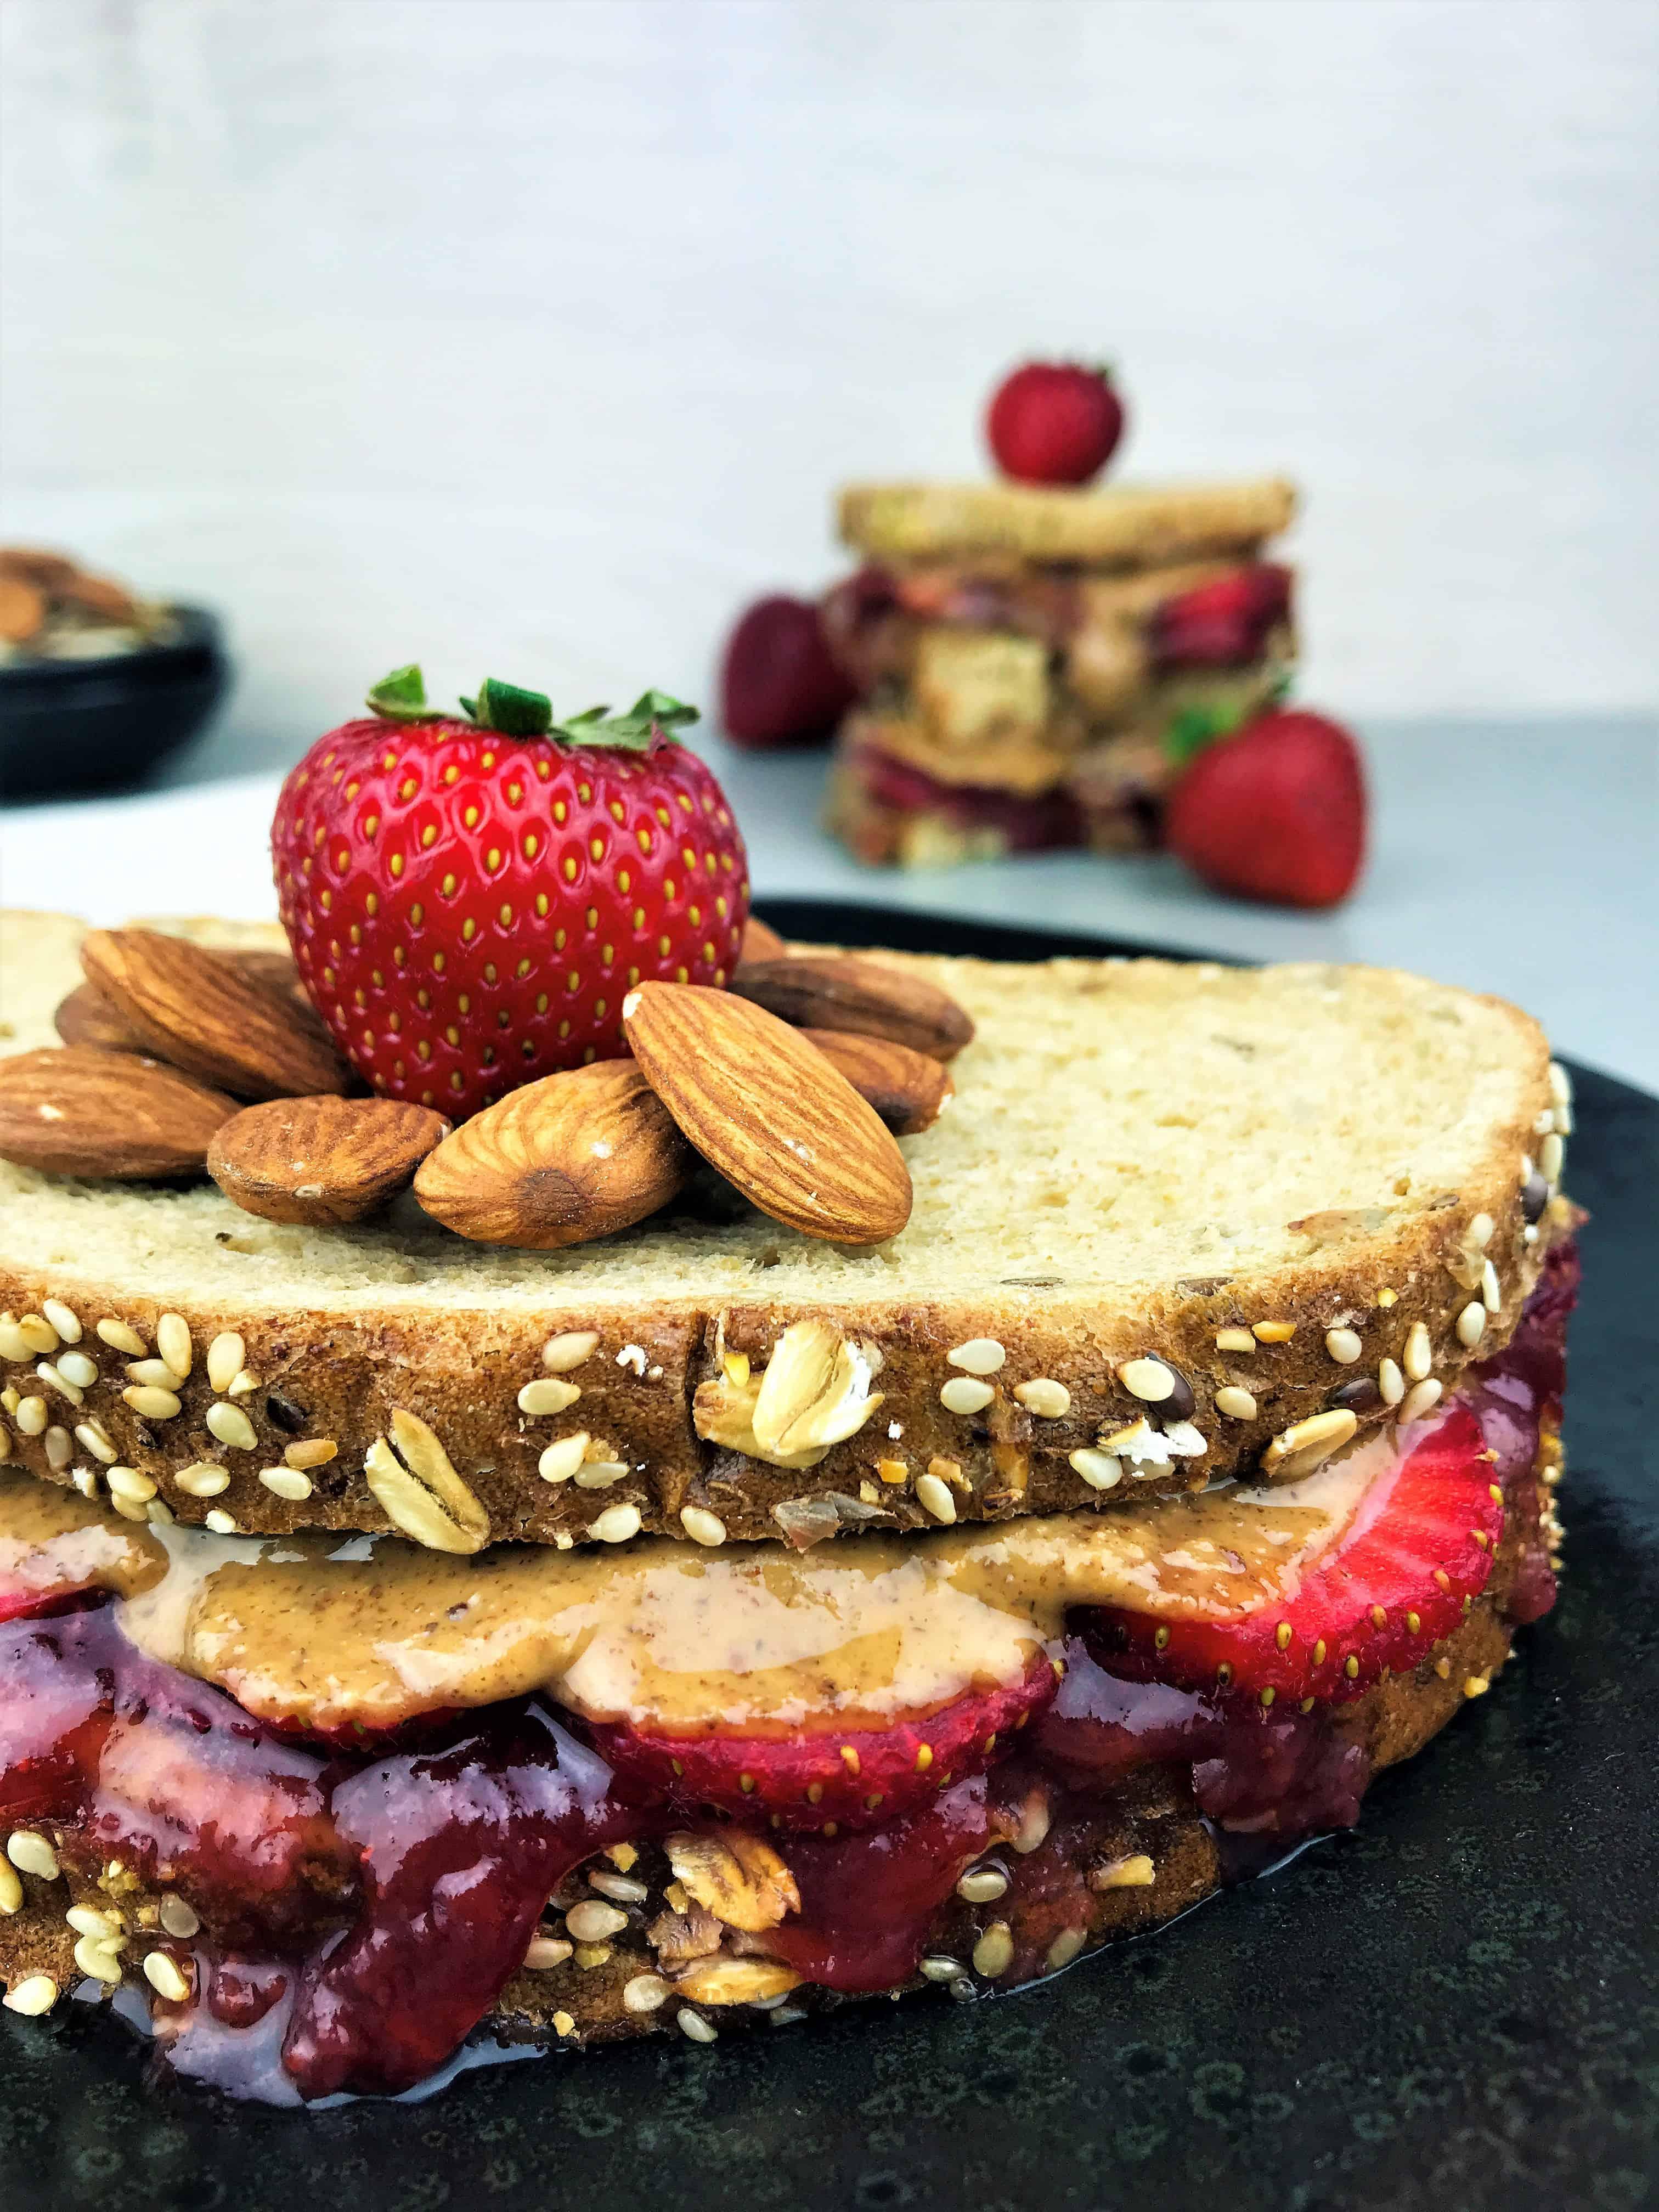 Copycat Starbucks almond butter sandwich on a plate